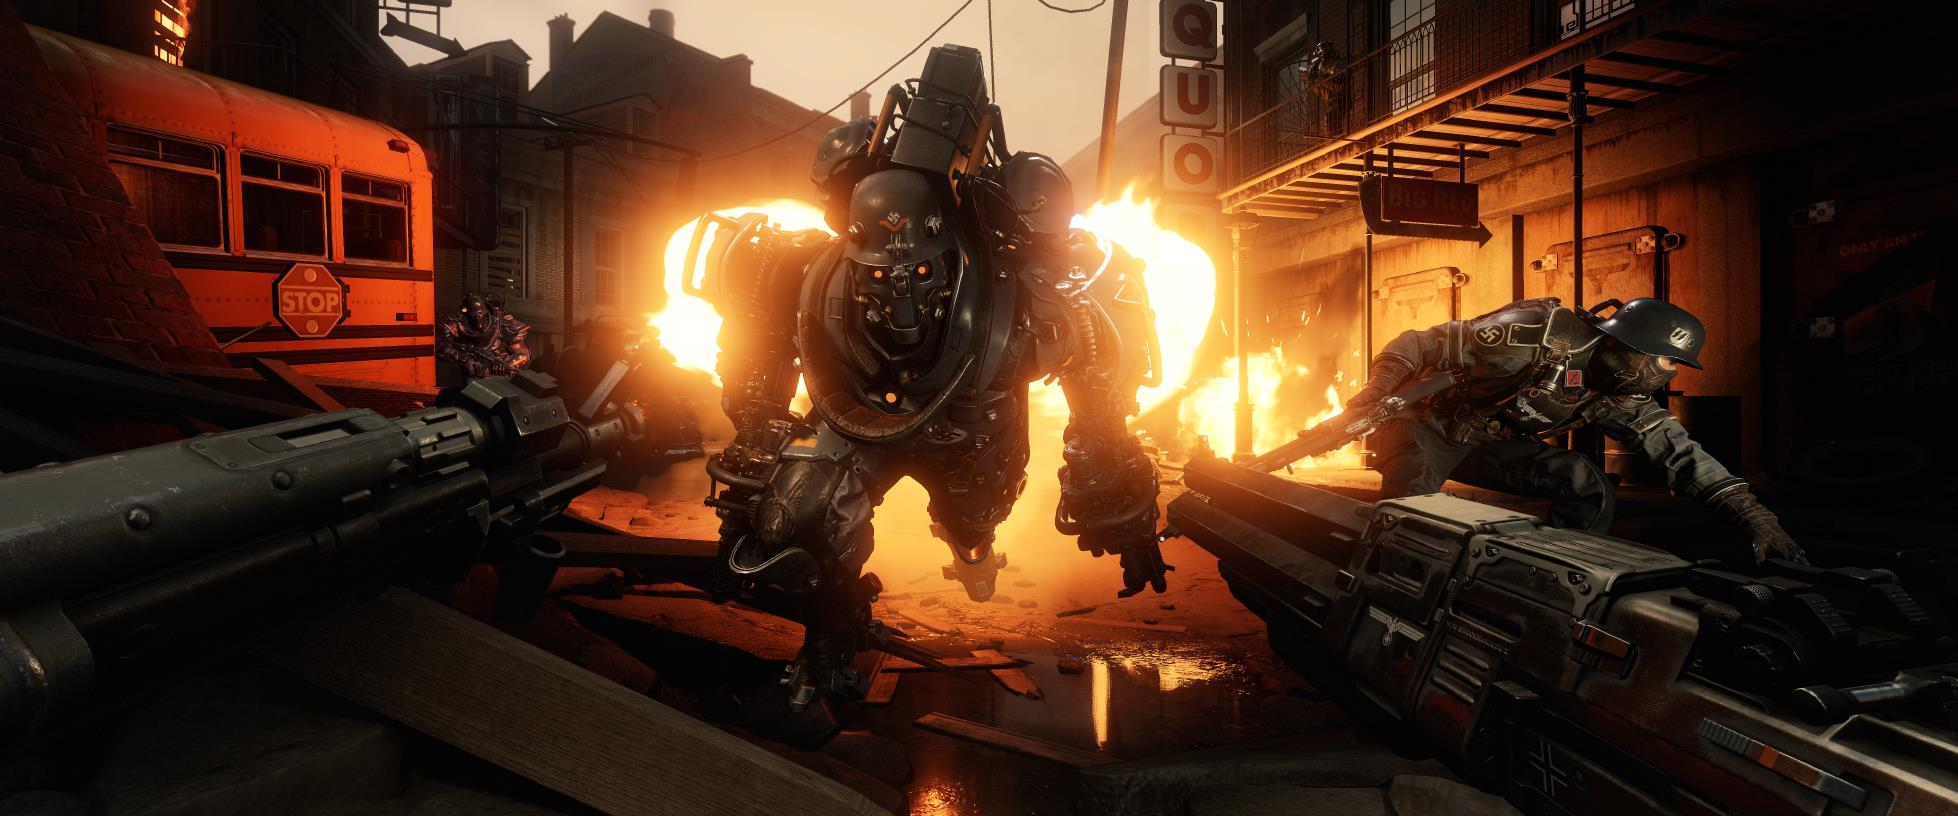 Image result for wolfenstein 2 colossus gameplay